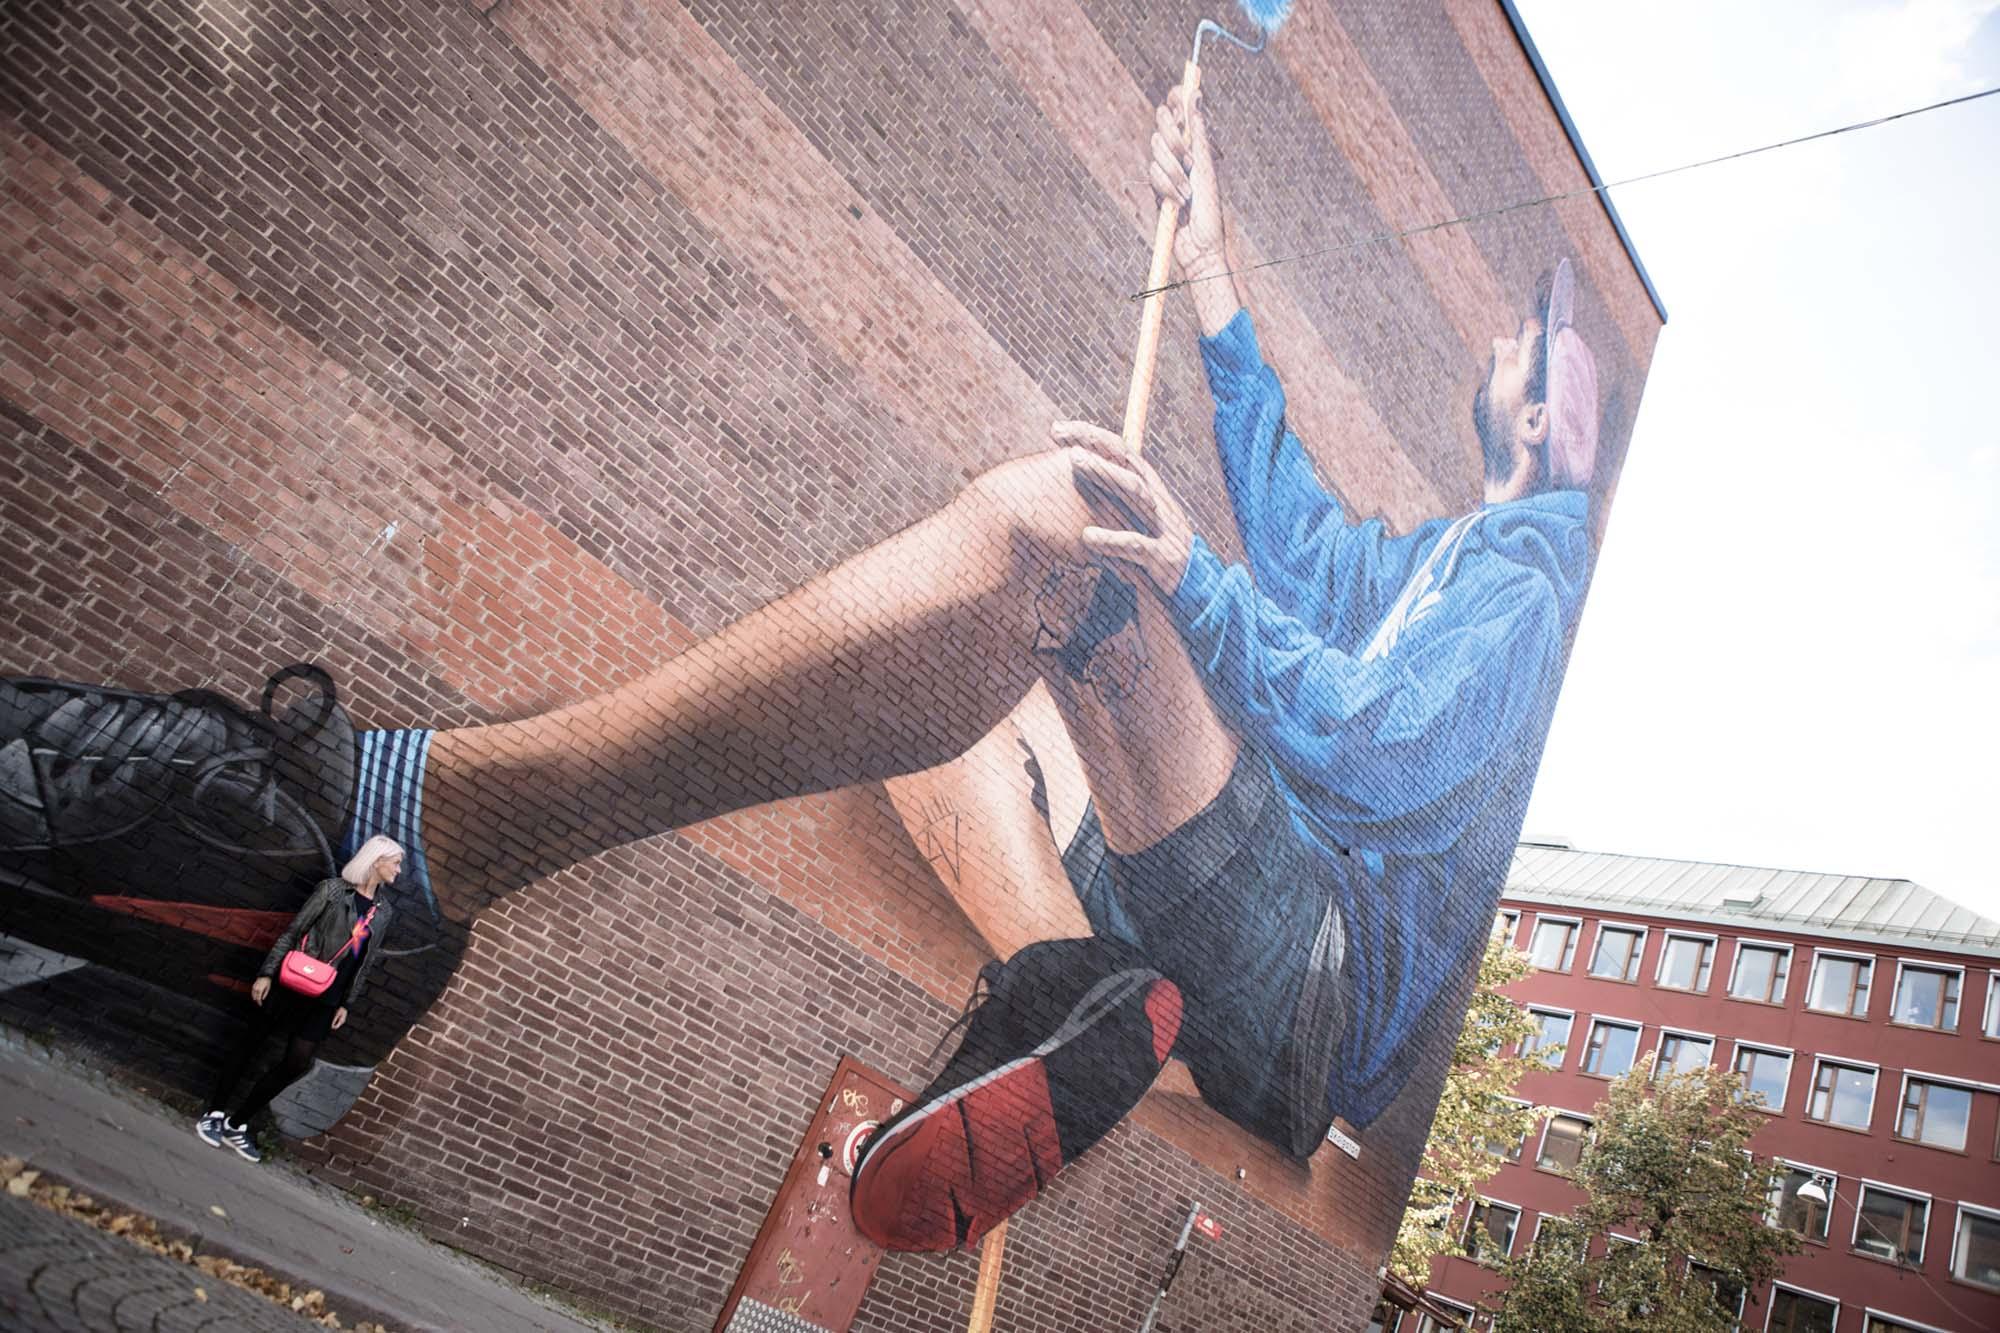 Street art in Boras, Sweden